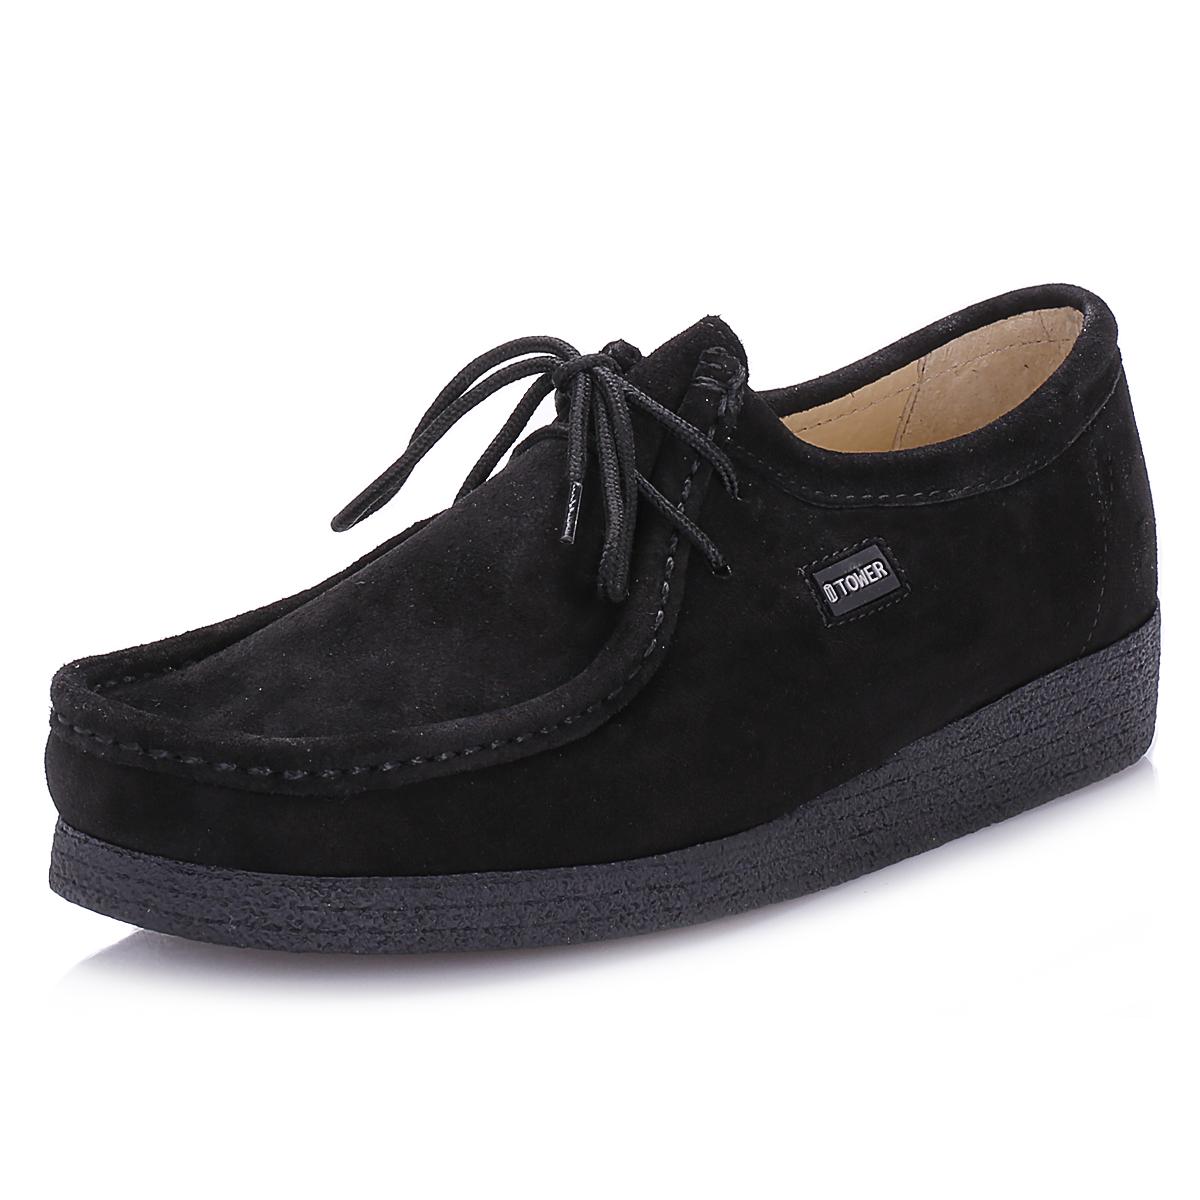 Tower Footwear Negro Wallabee Suede Zapatos-UK 7 mbWvigm